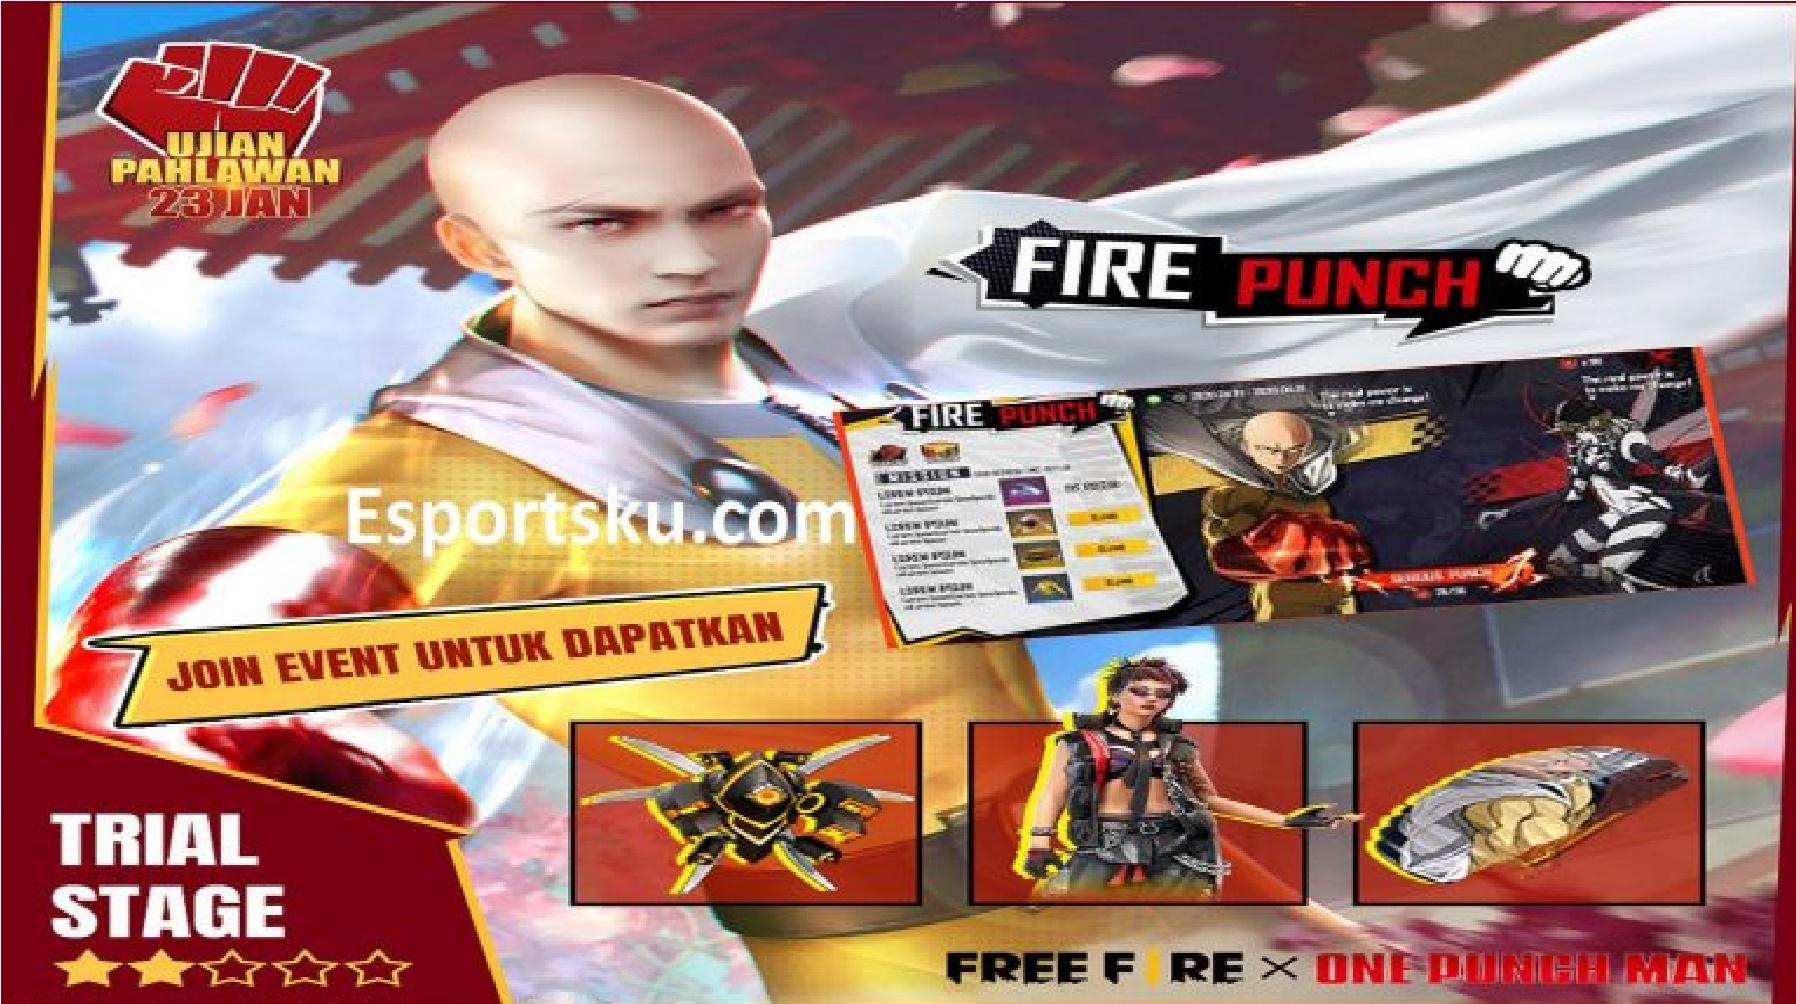 Free Diamond In Free Fire Ff X One Punch Man For You Esportsku